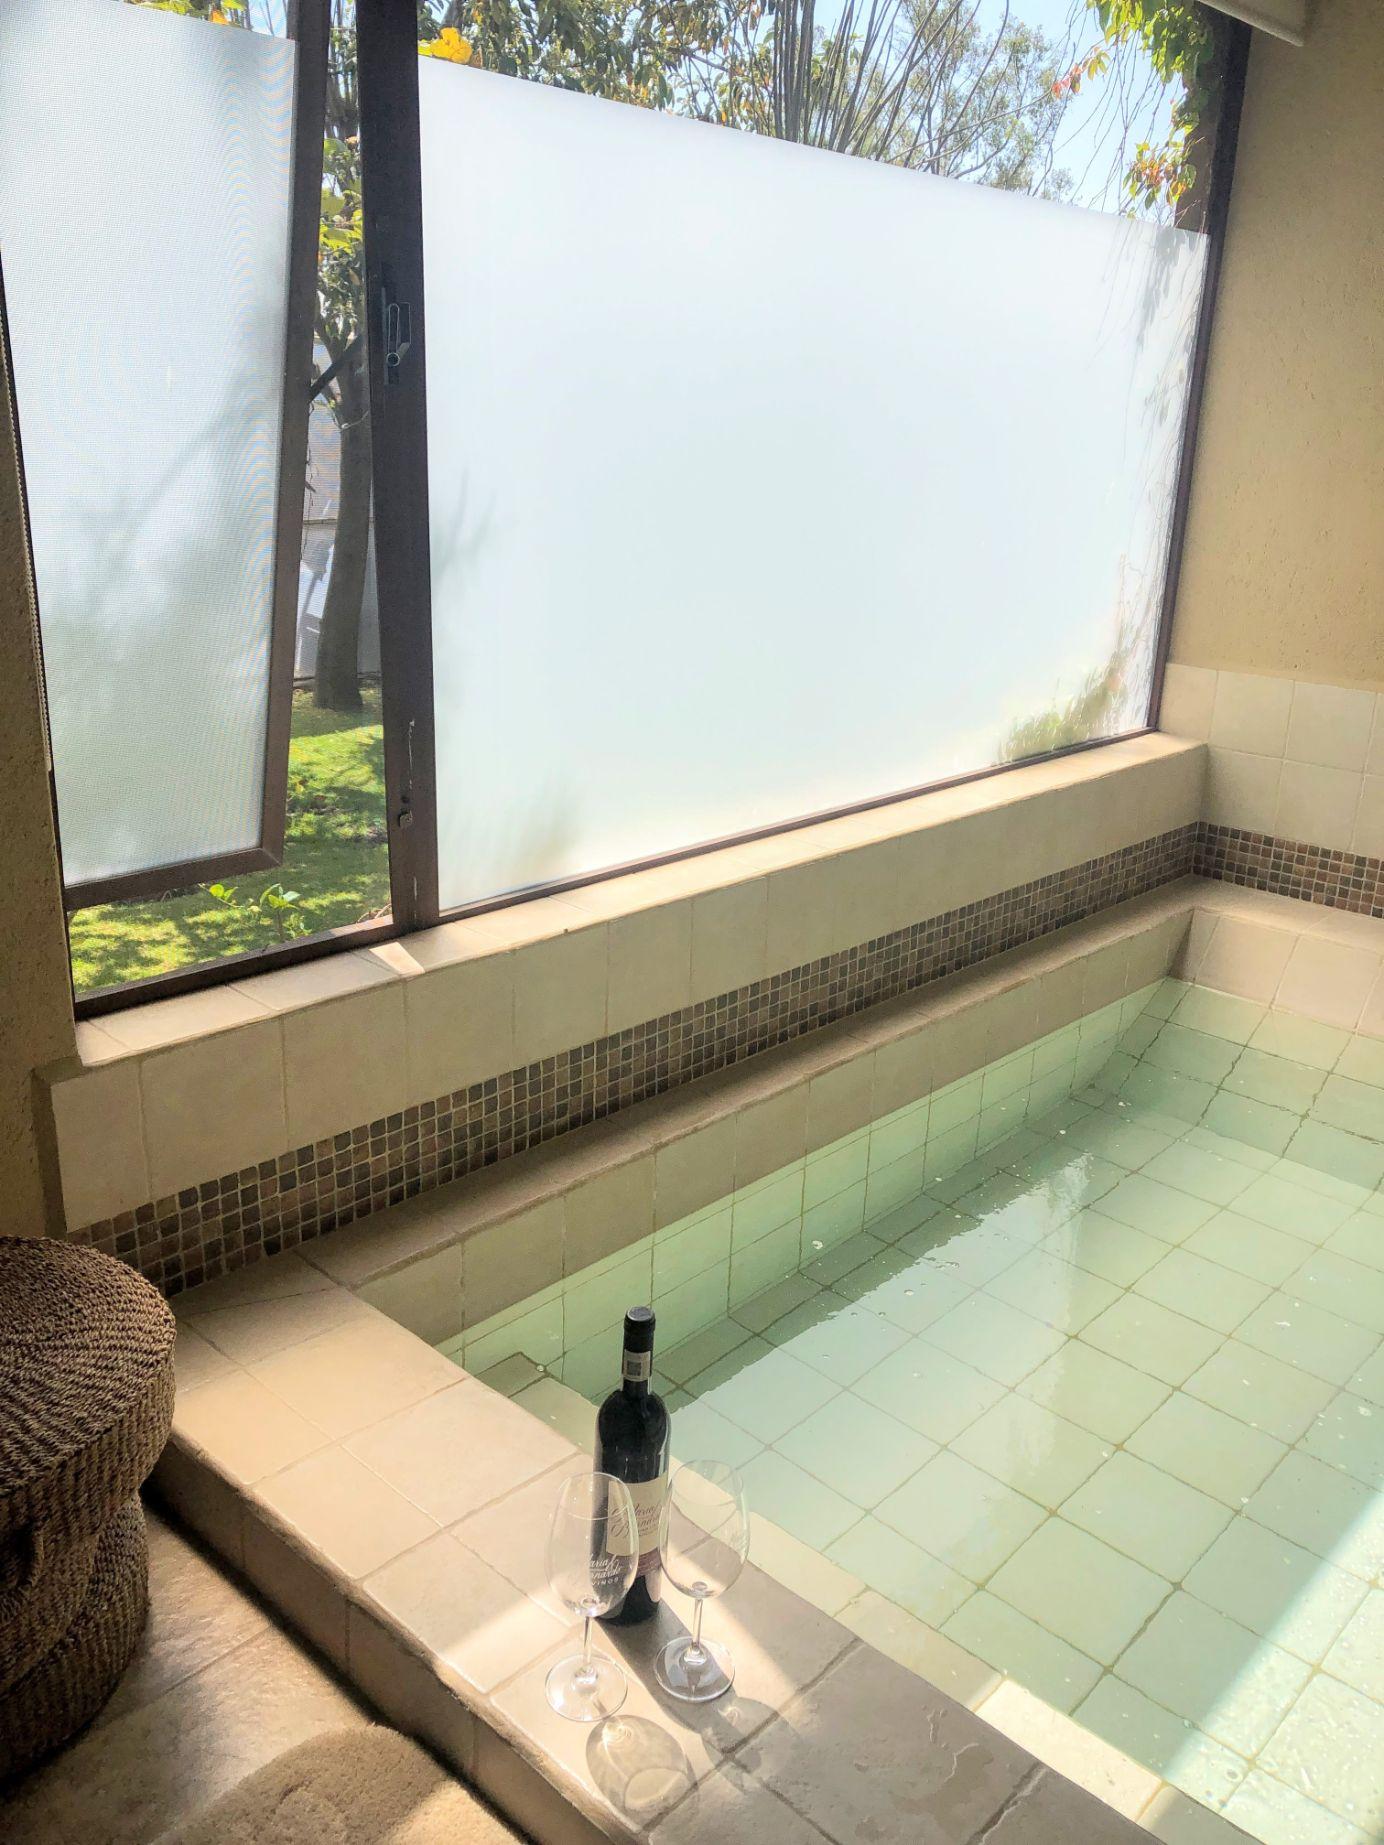 thermal pool in the Tempranillo room at Maria y Bernardo vineyard